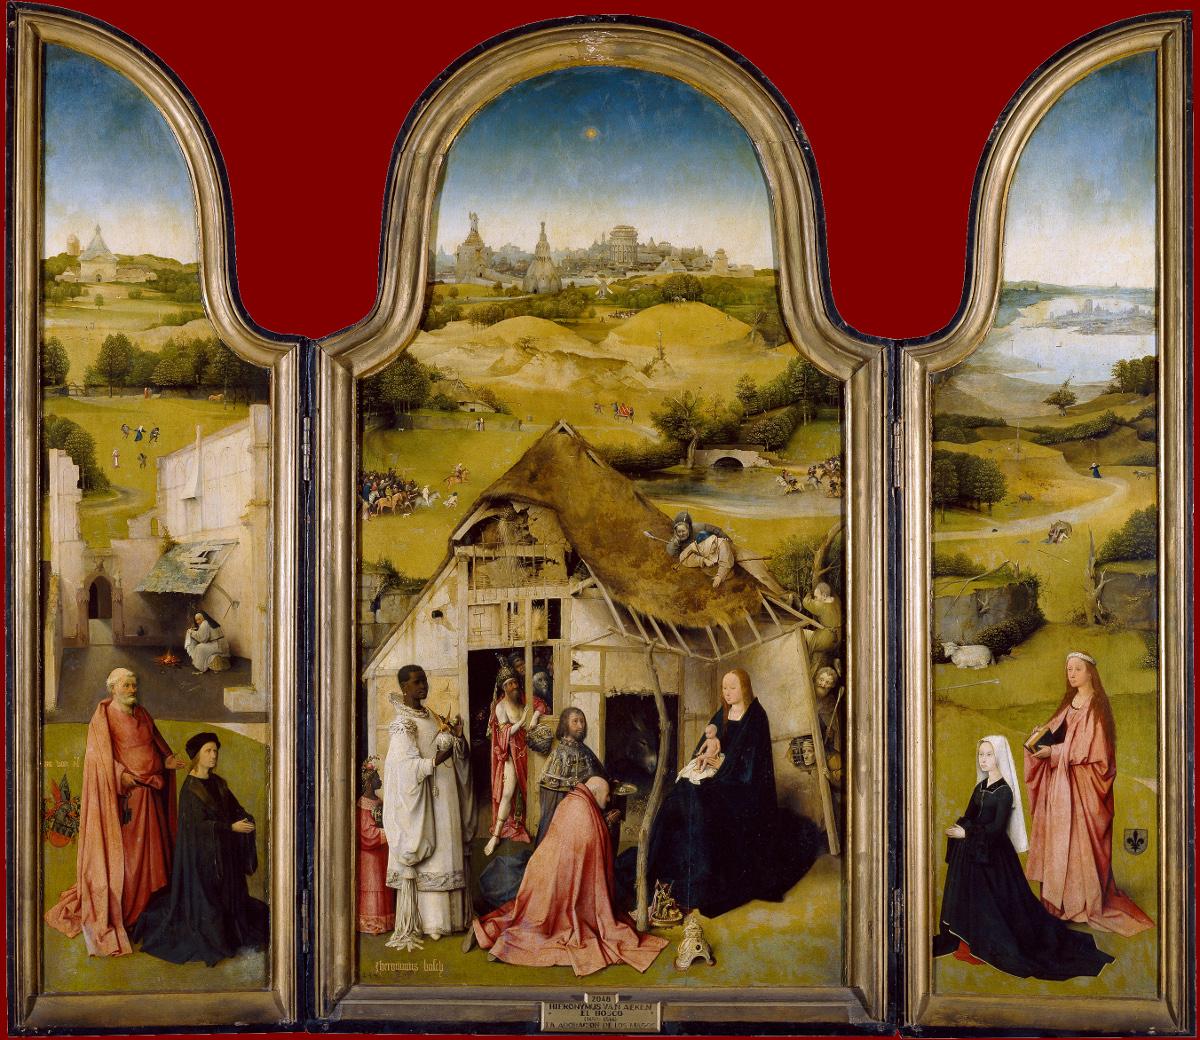 Jheronimus Bosch The Adoration of the Magi